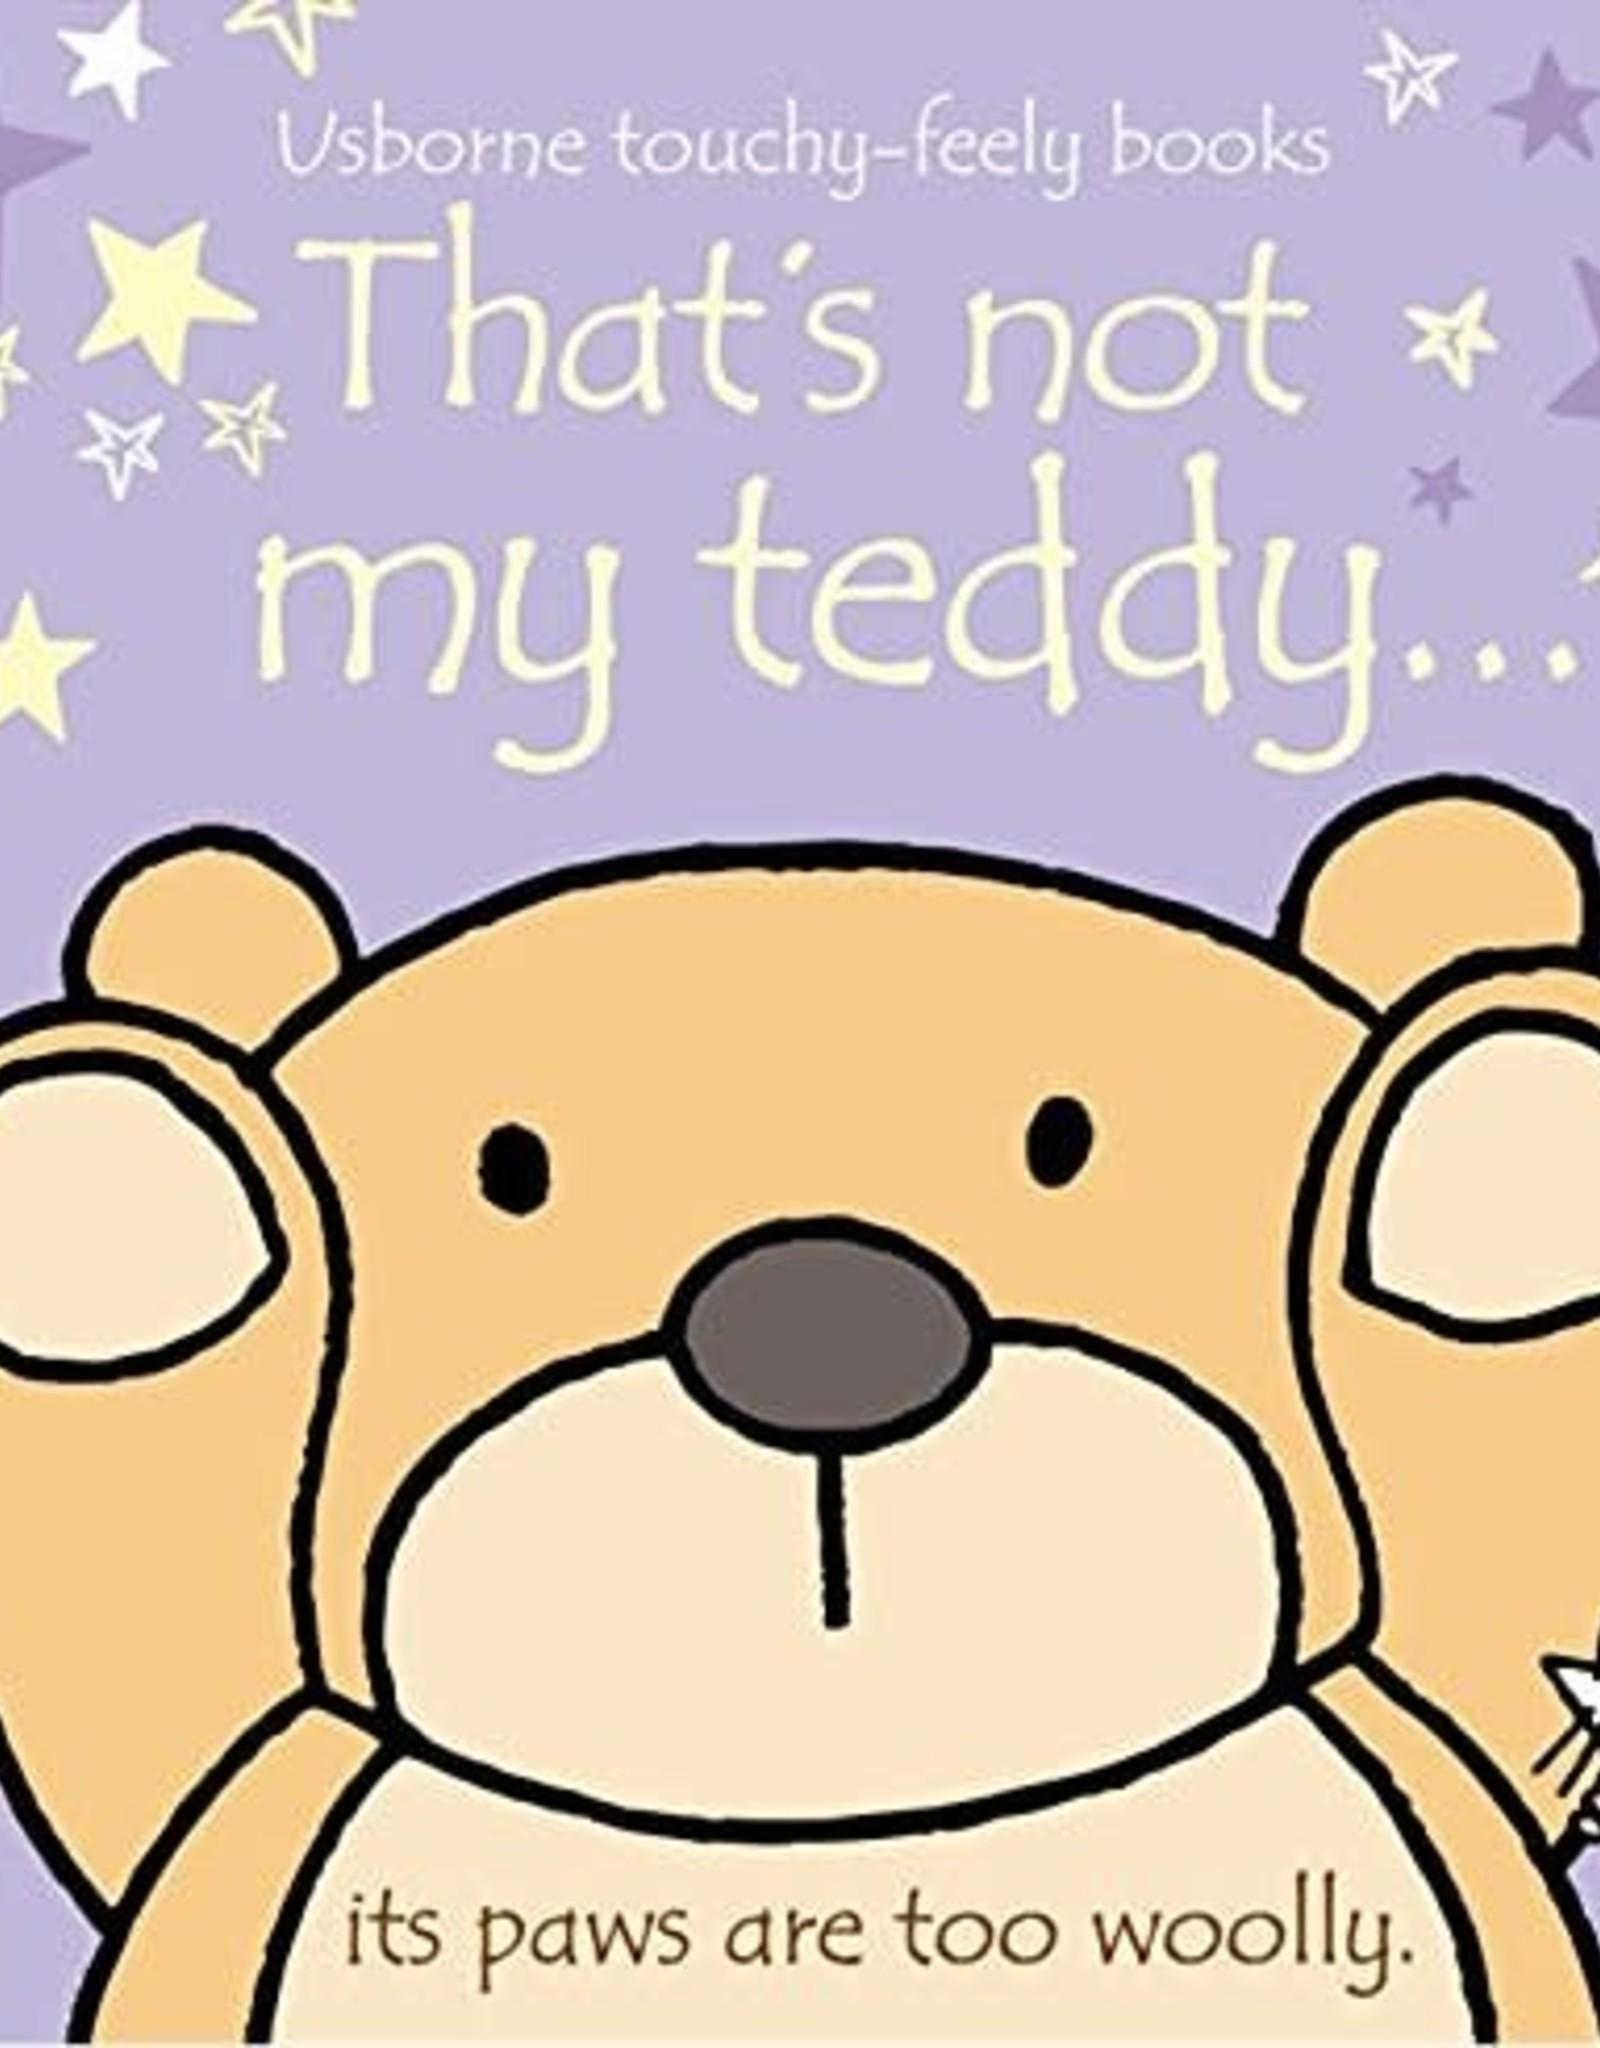 Usborne Usborne That's Not My Teddy